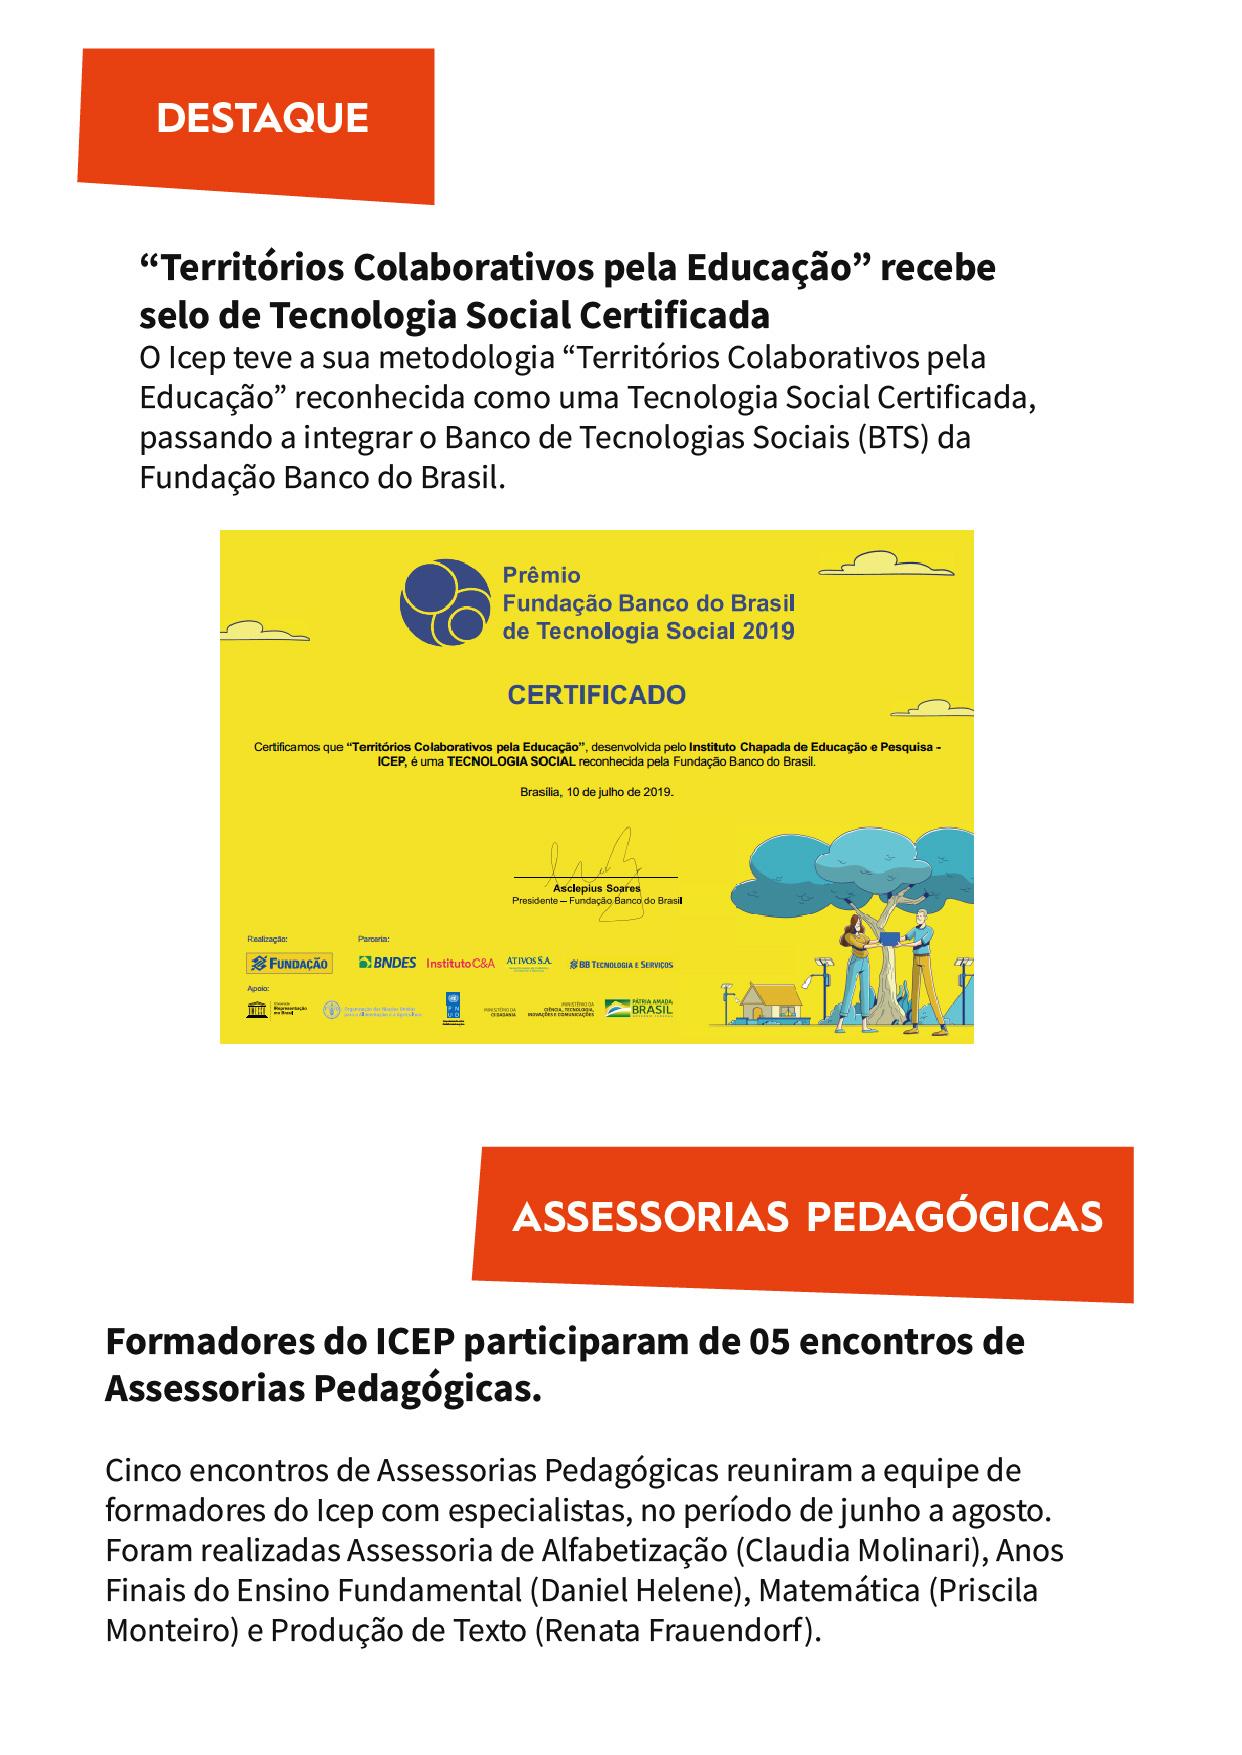 ICEP - Boletim edição 2, versão impressa_Fundo copy 14